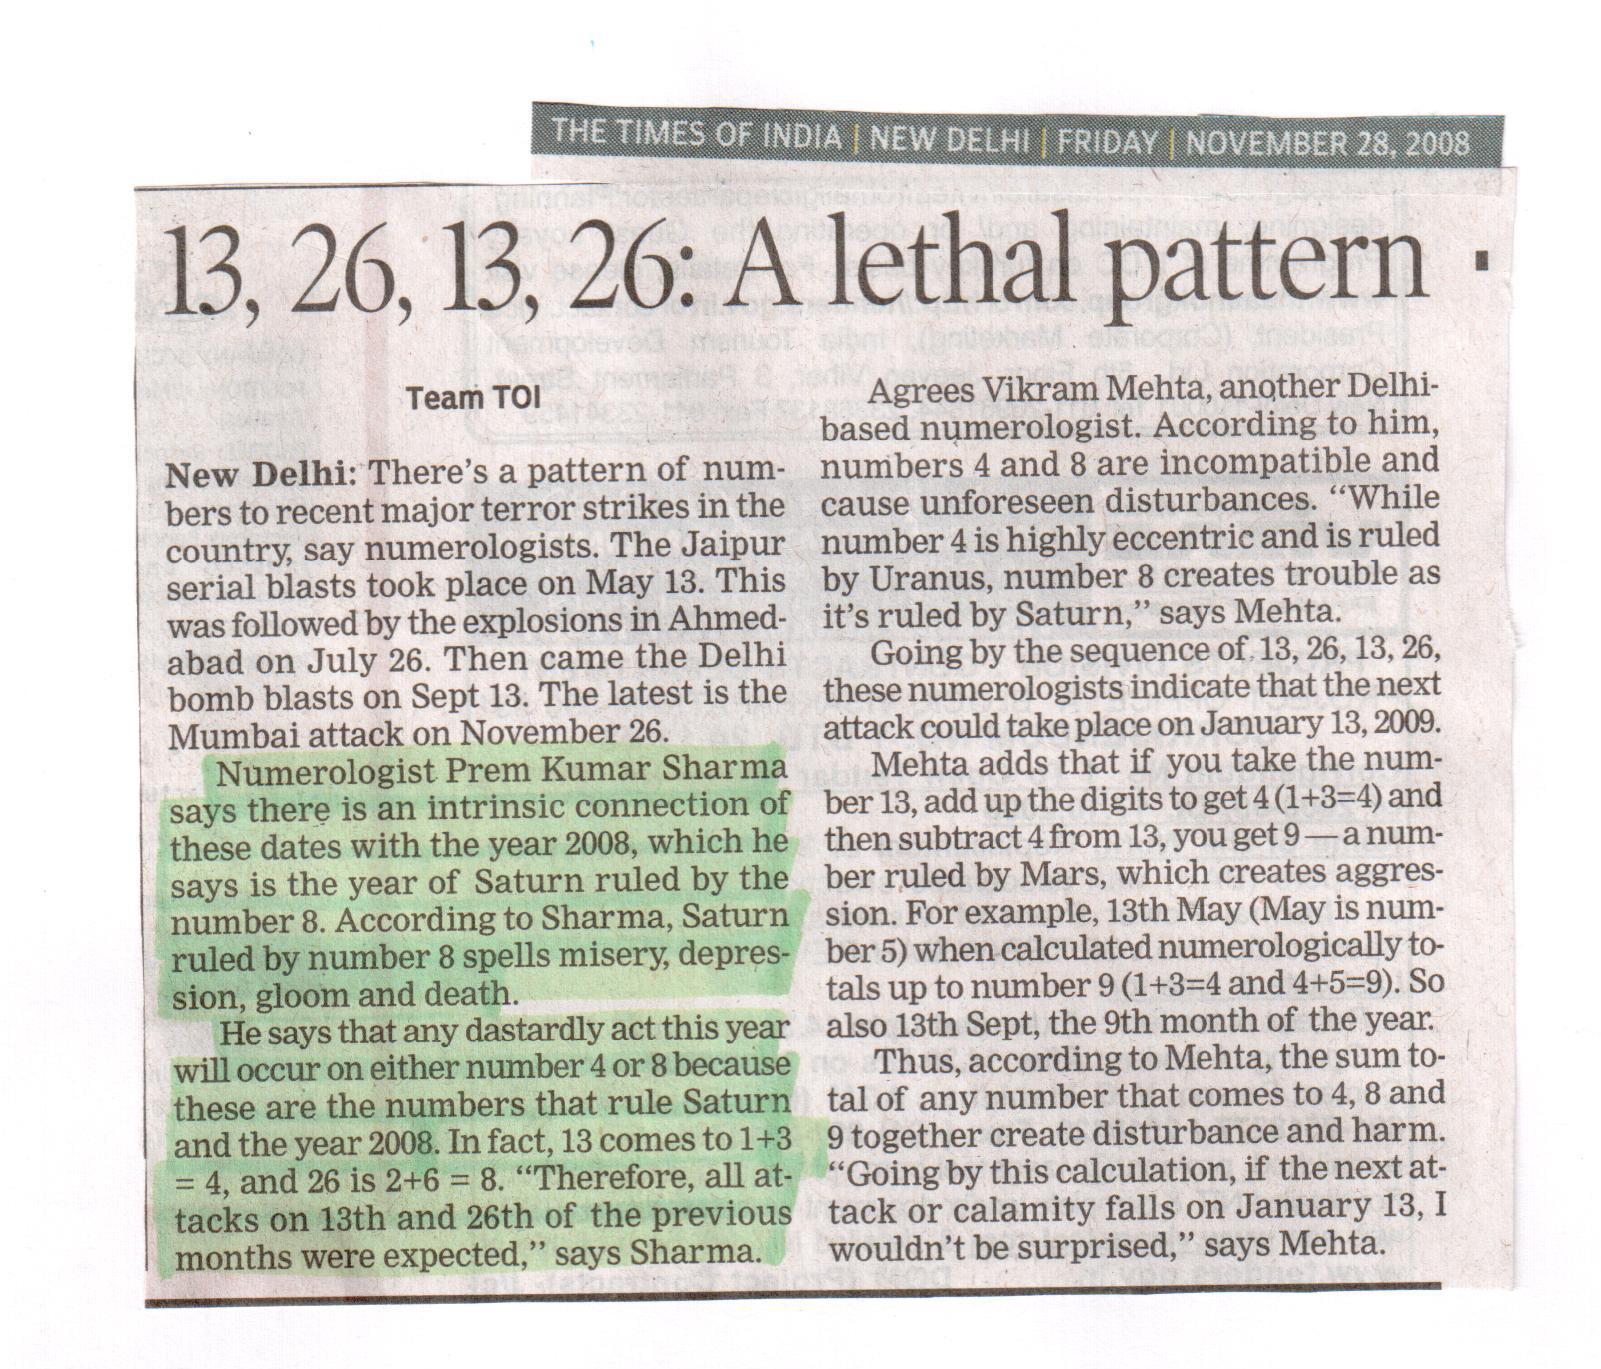 13, 26, 13, 26 : A Lethal Pattern